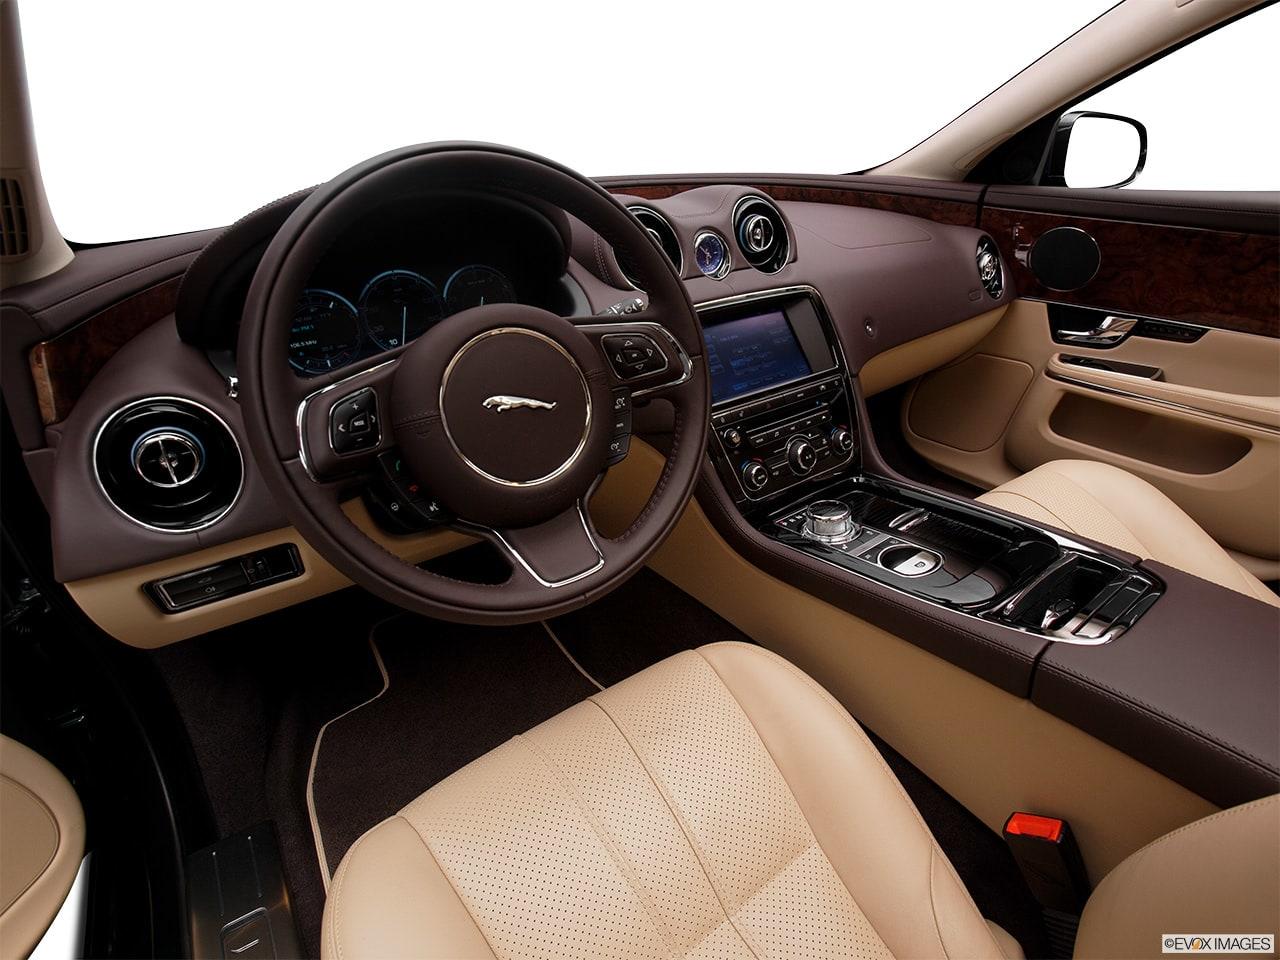 Jaguar XJ 2012 Interior